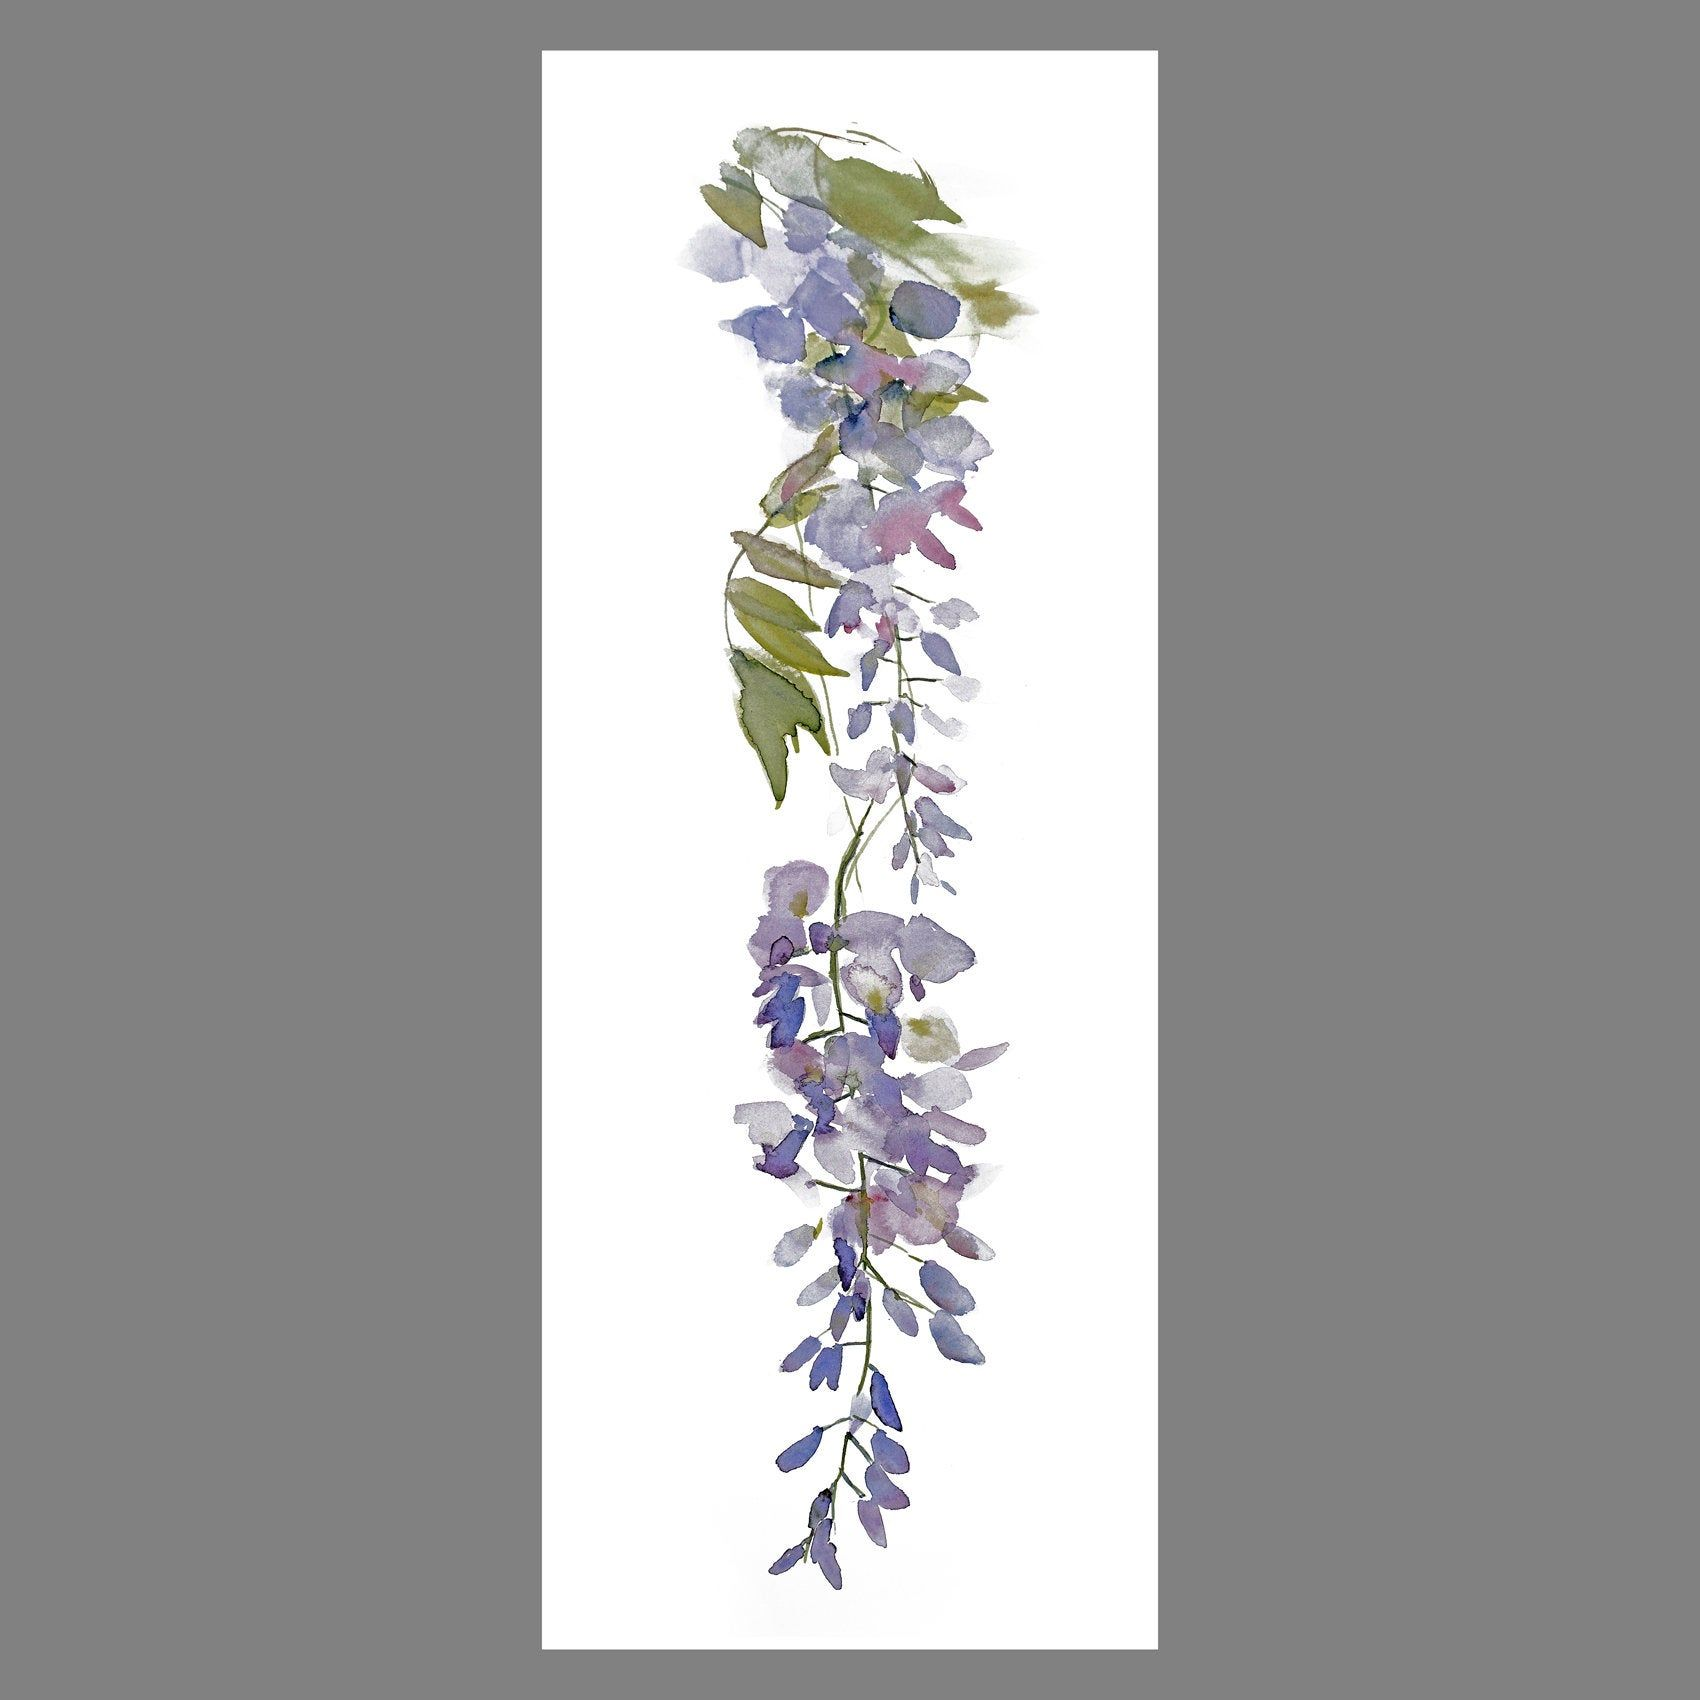 Wisteria 5 Tall Vertical Print Of Original Artwork Narrow Etsy Fine Art Giclee Prints Original Artwork Nursery Paintings